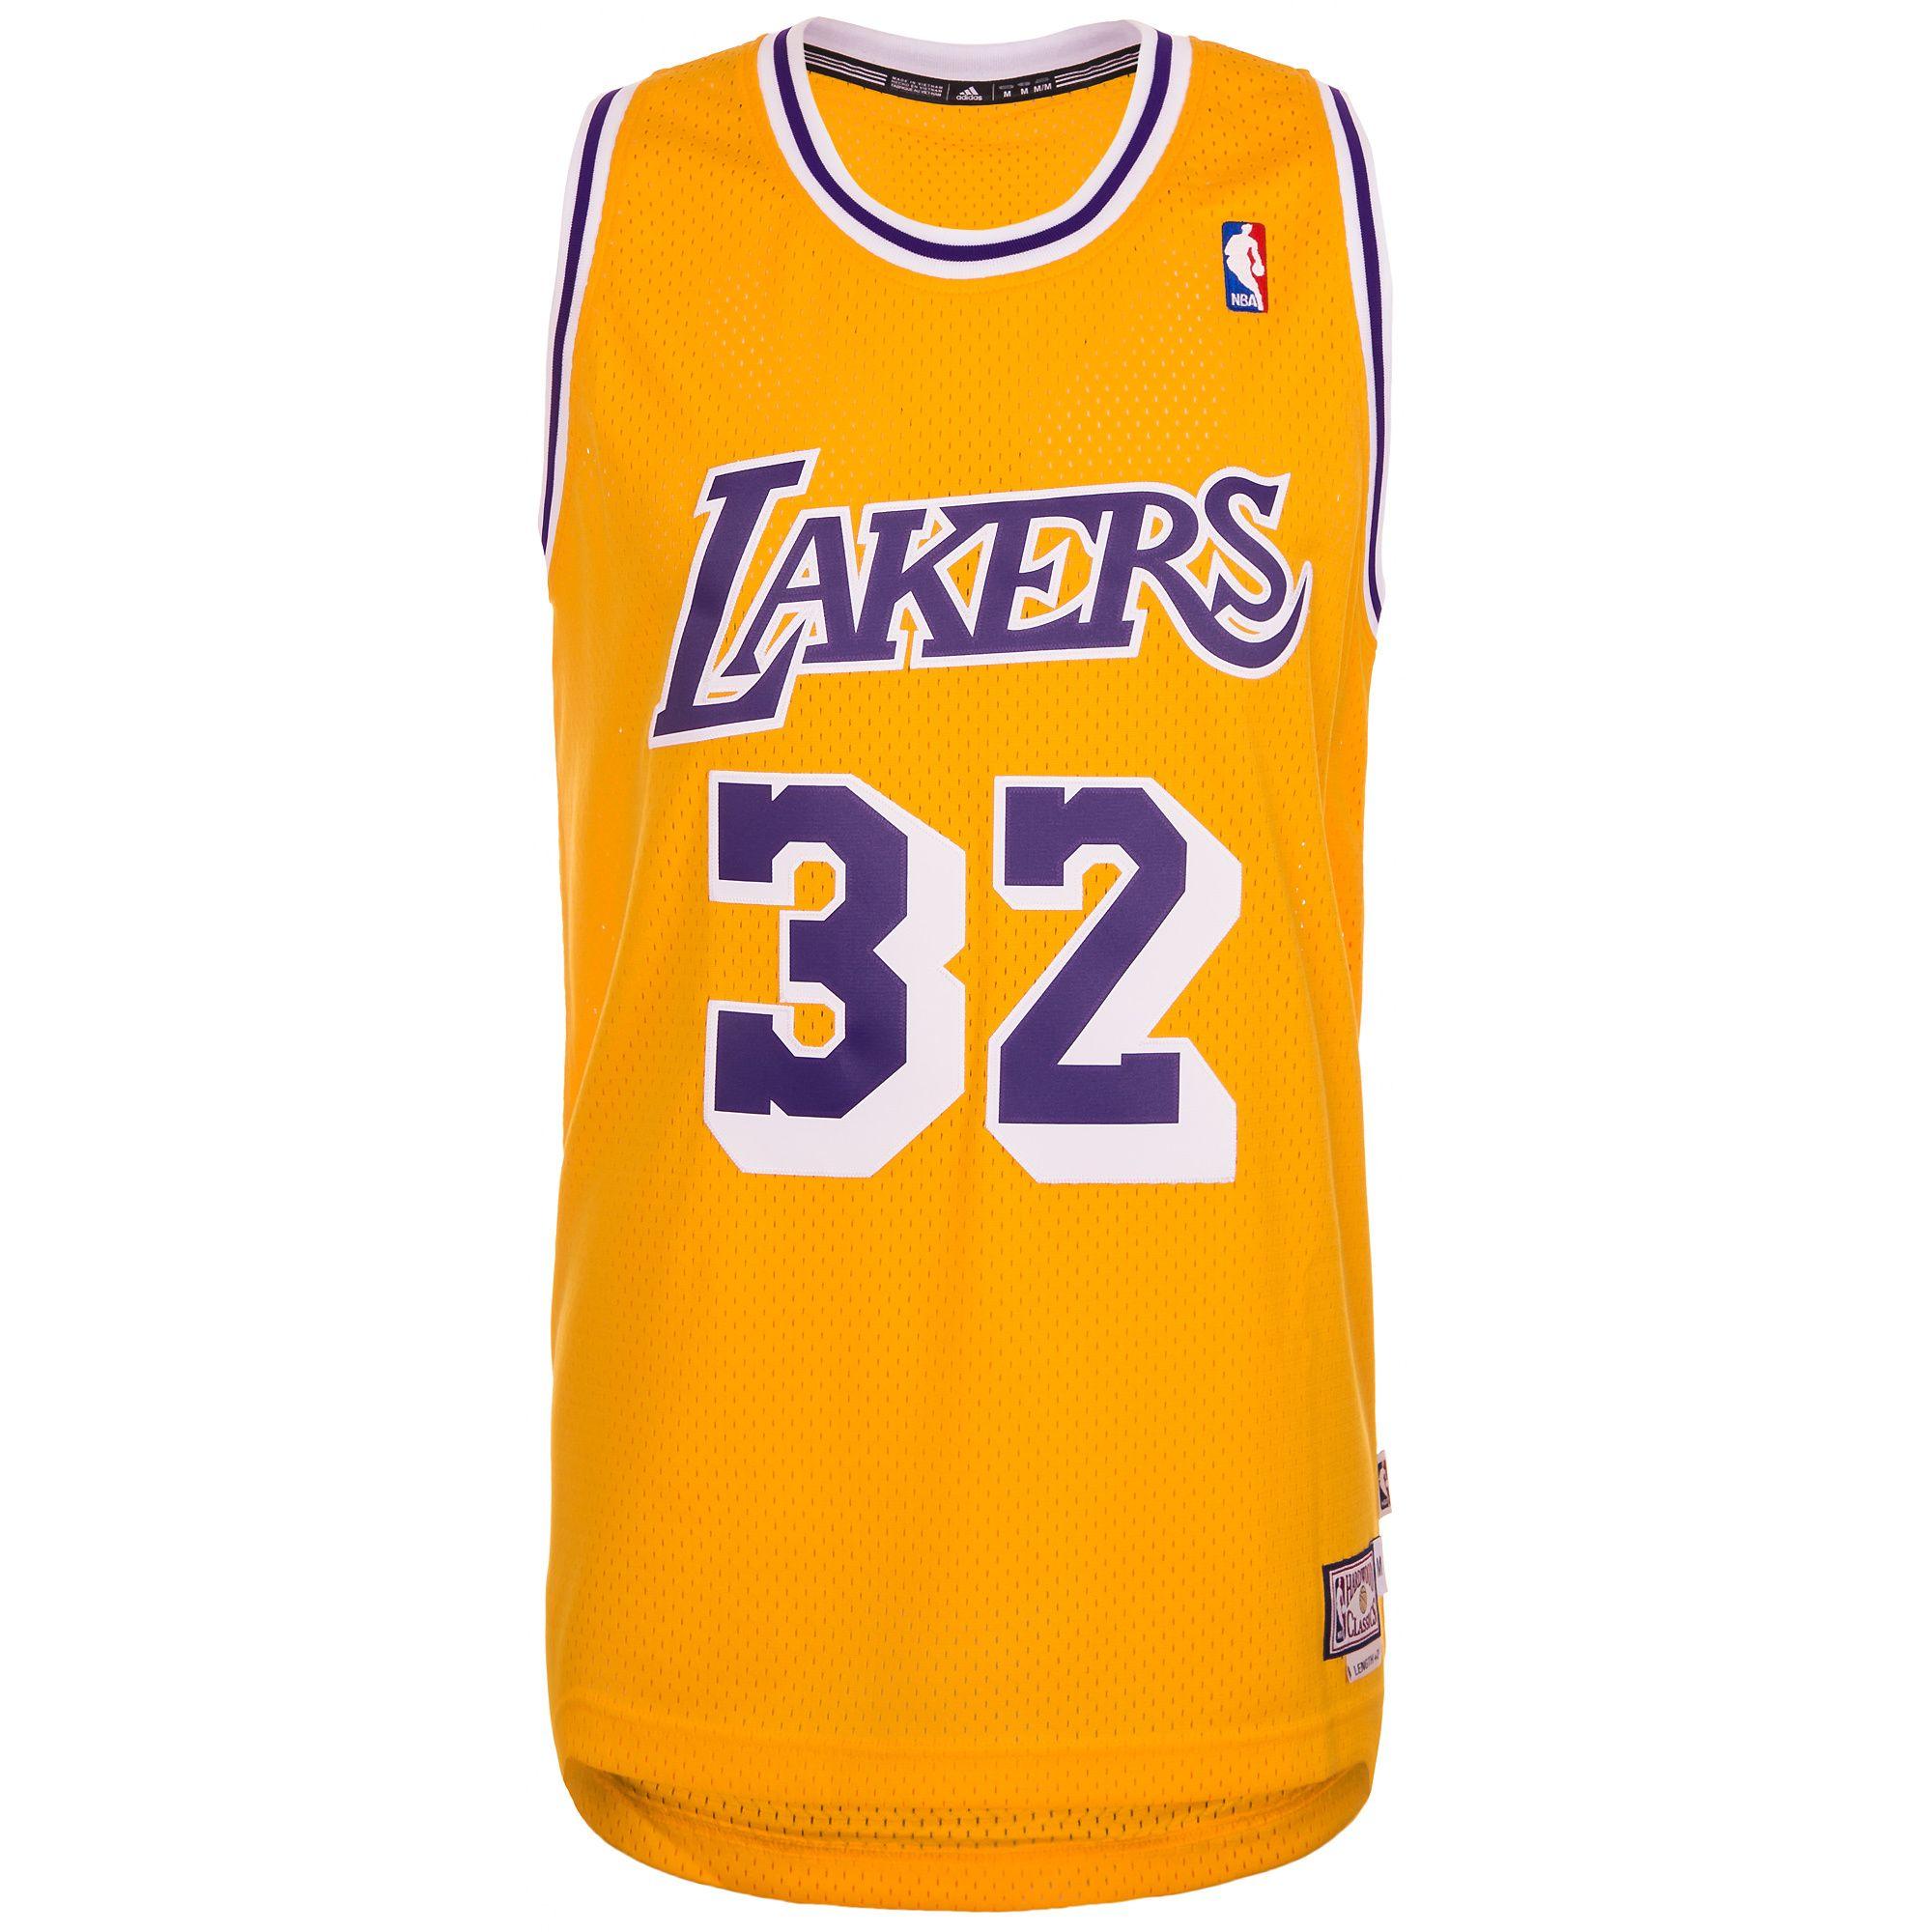 ADIDAS PERFORMANCE adidas Performance Los Angeles Lakers Johnson Swingman Basketballtrikot Herren